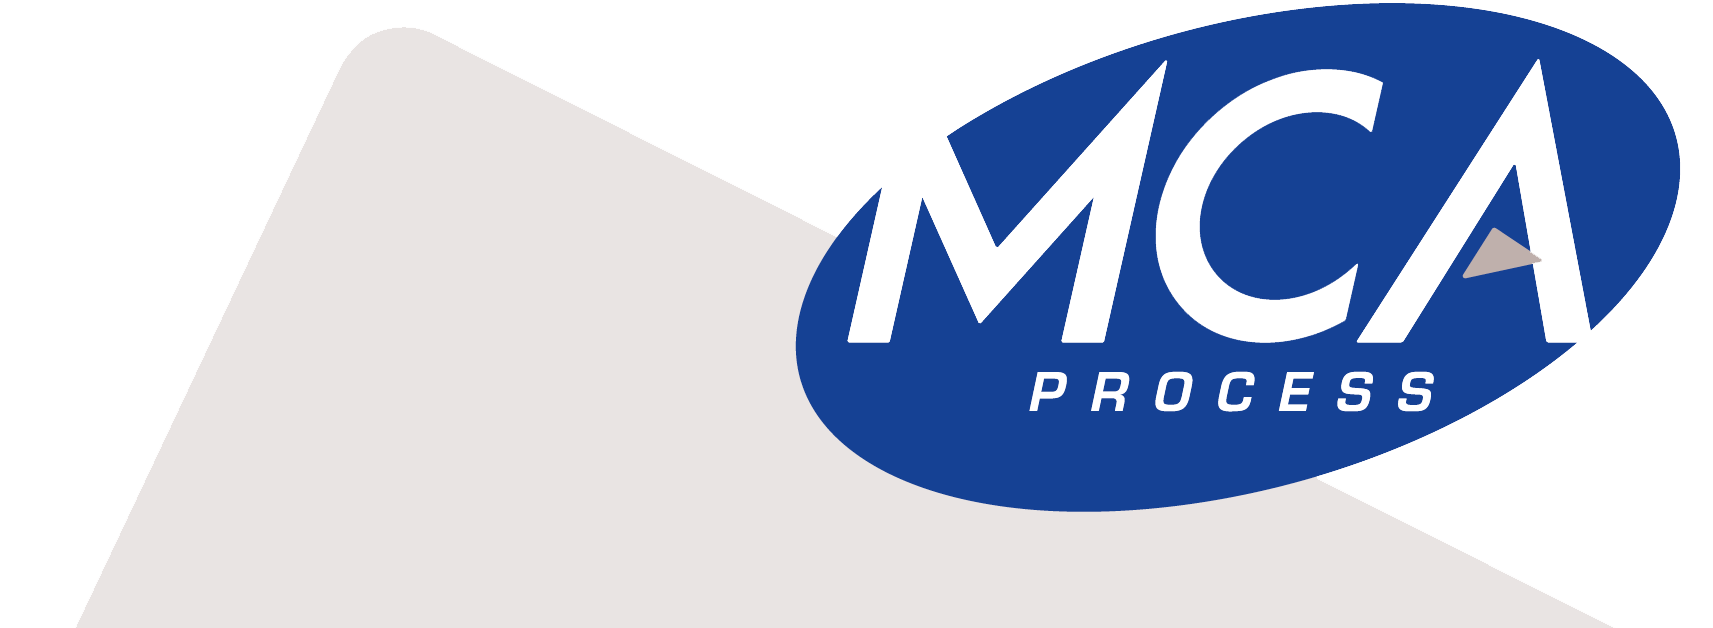 footer-logo-mca